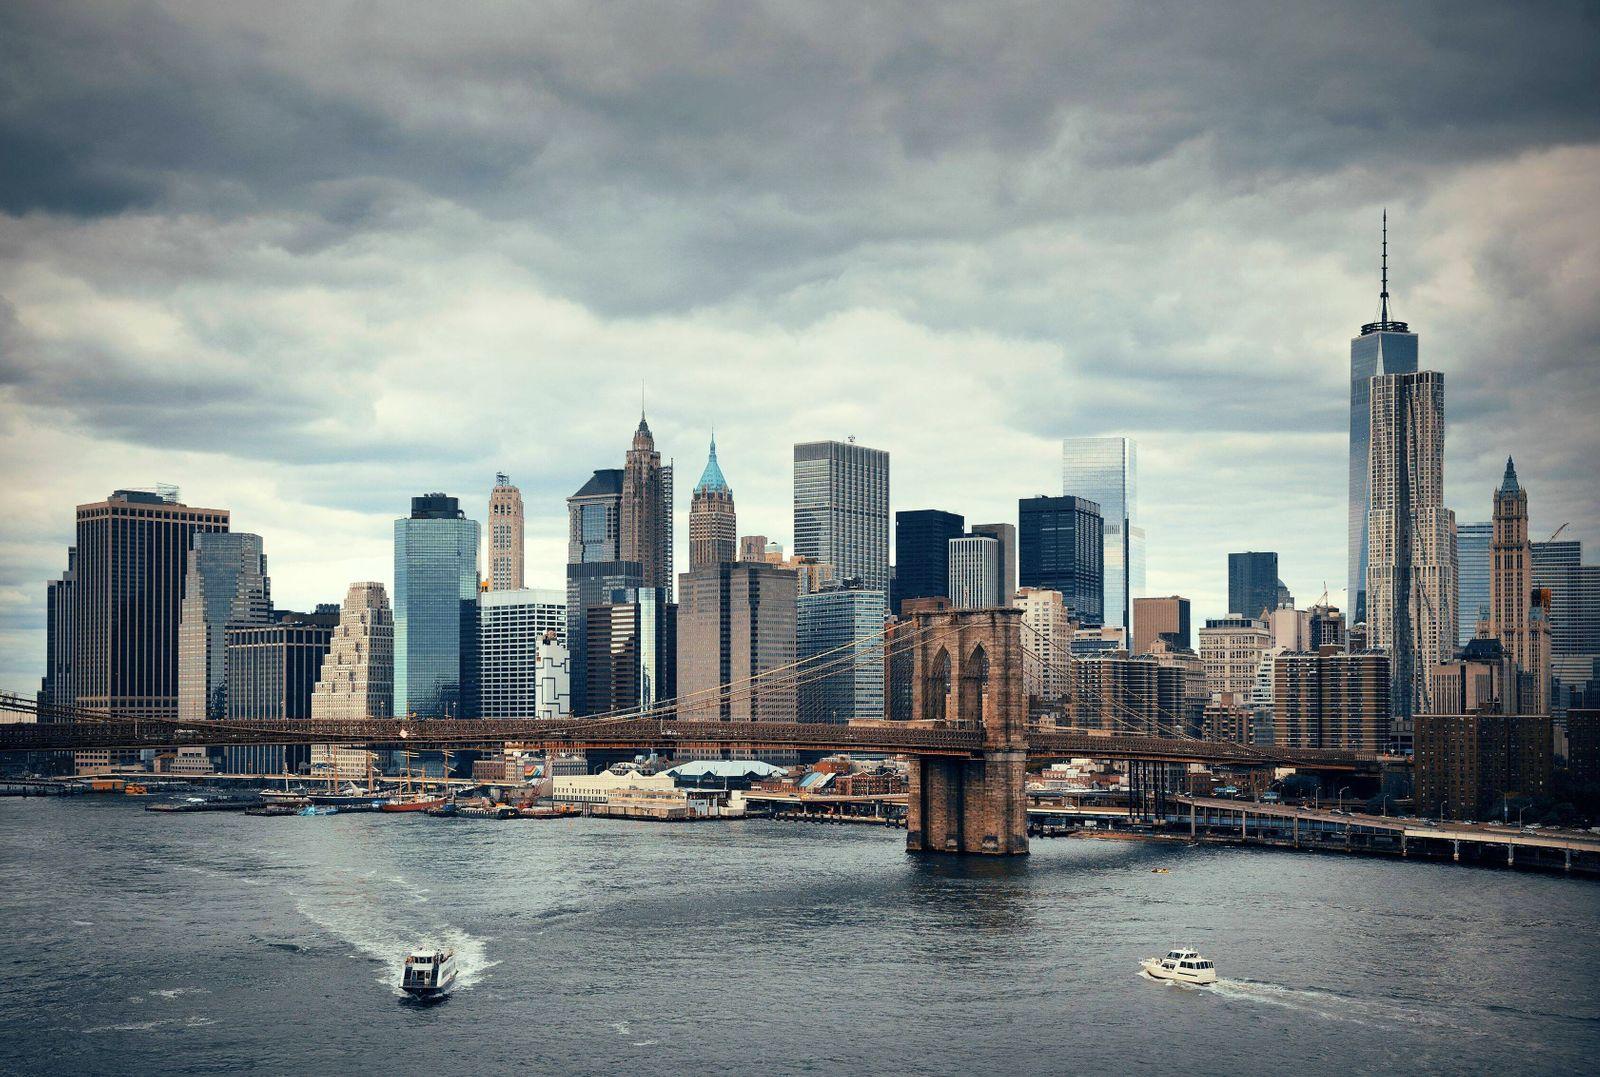 travel New; York New York City Cityscape architecture Water New York Skyline United Ny PUBLICATIONxNOTxINxCHN 2681248525